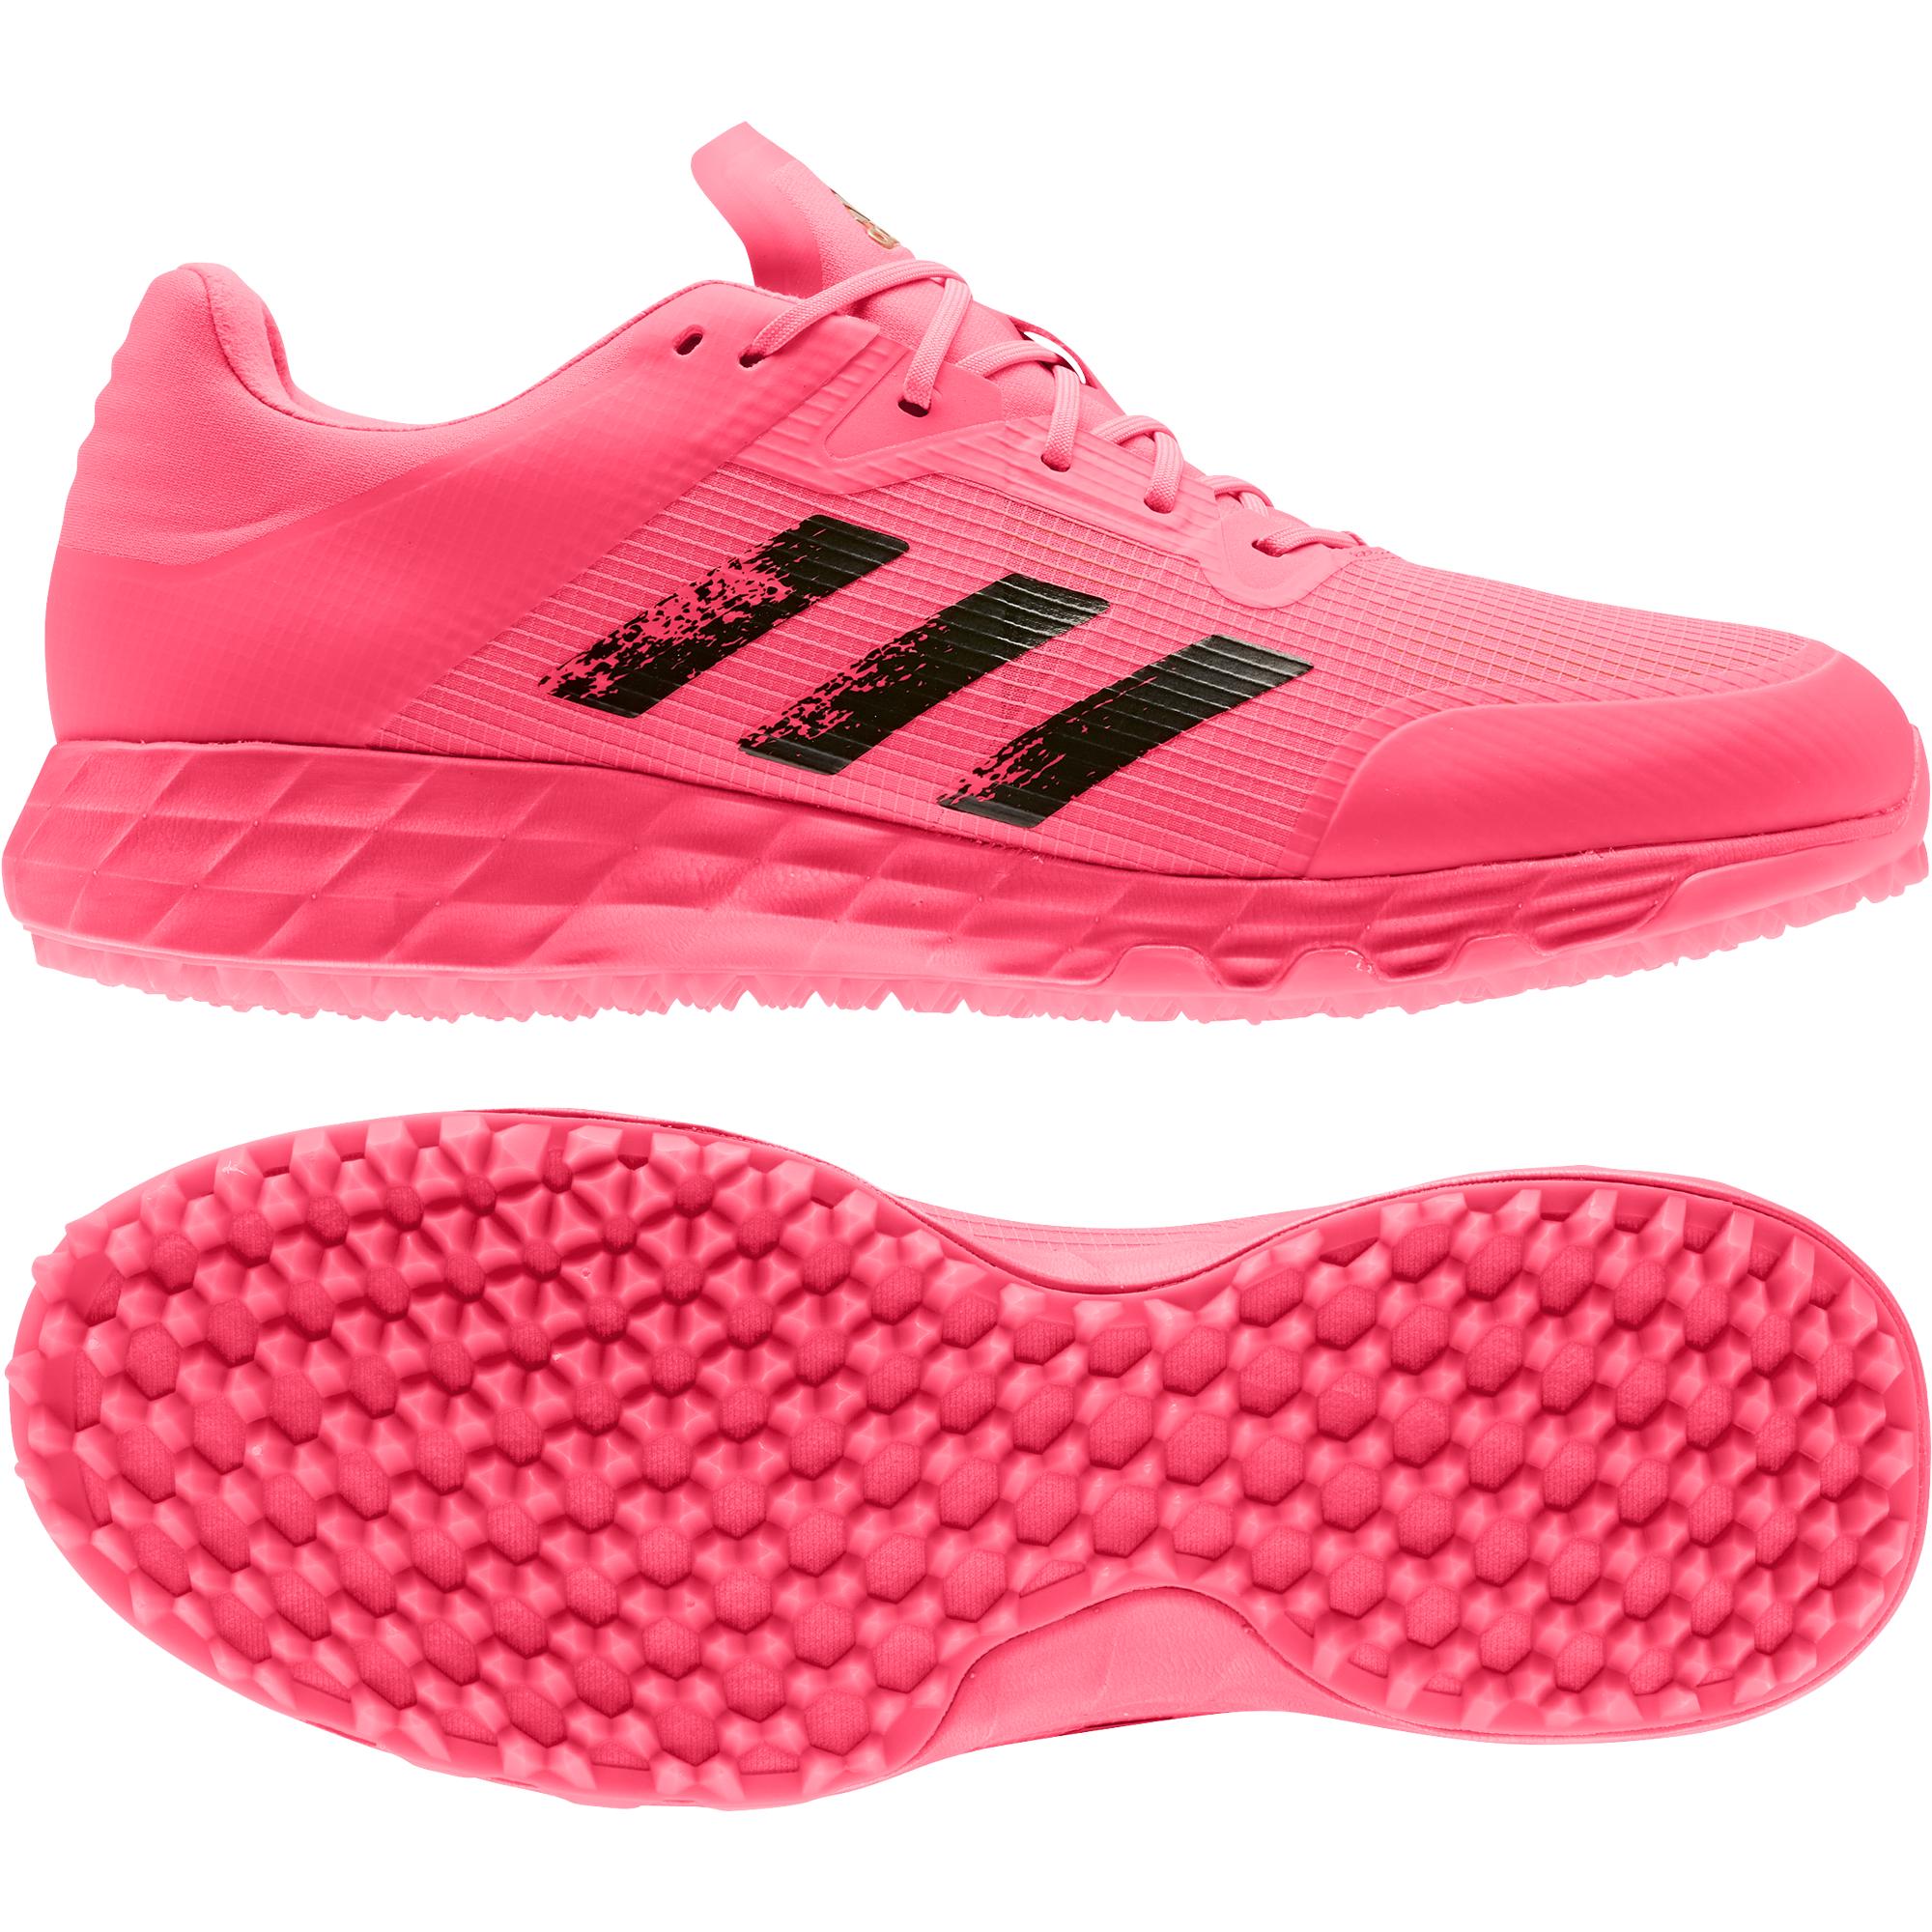 Adidas HOCKEY LUX 2.0S 20/21 pink